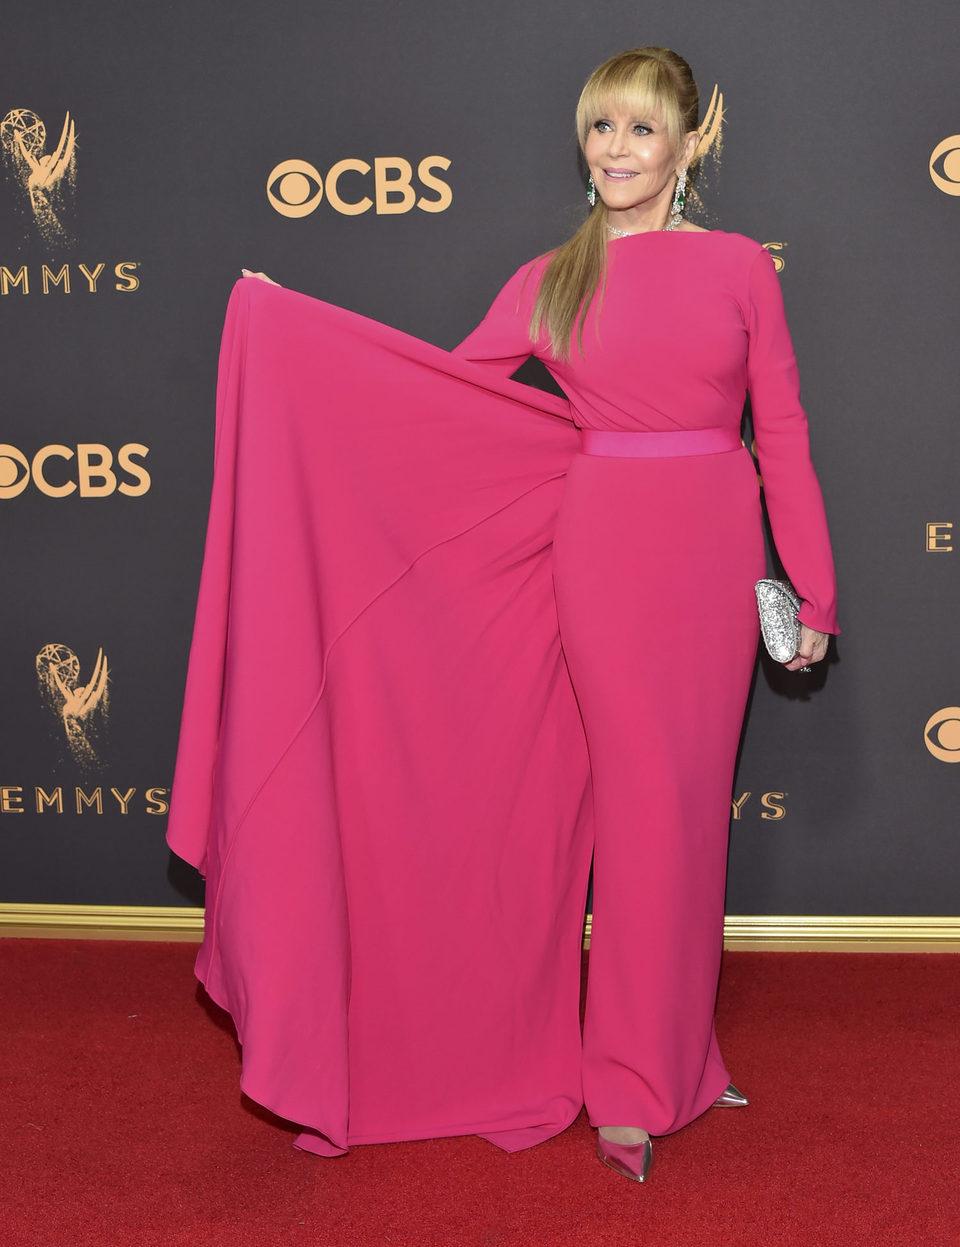 Jane Fonda at the Emmys 2017 red carpet